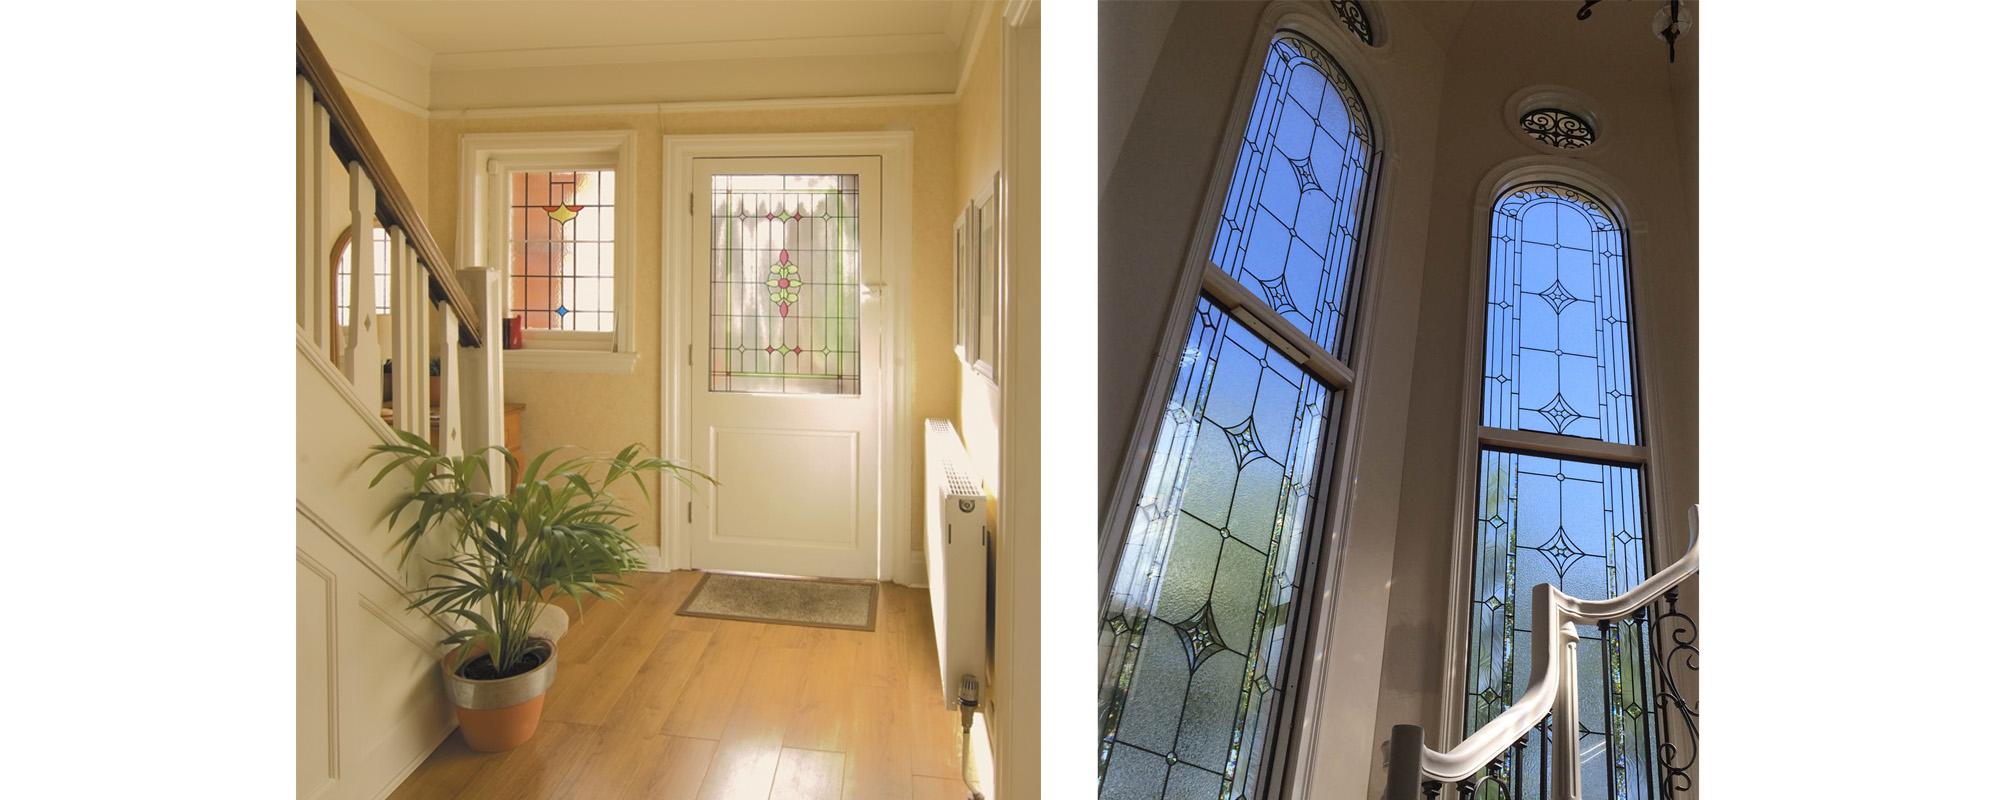 Kenyons Glasscustom Decorative Glass For Doorswindowscabinets